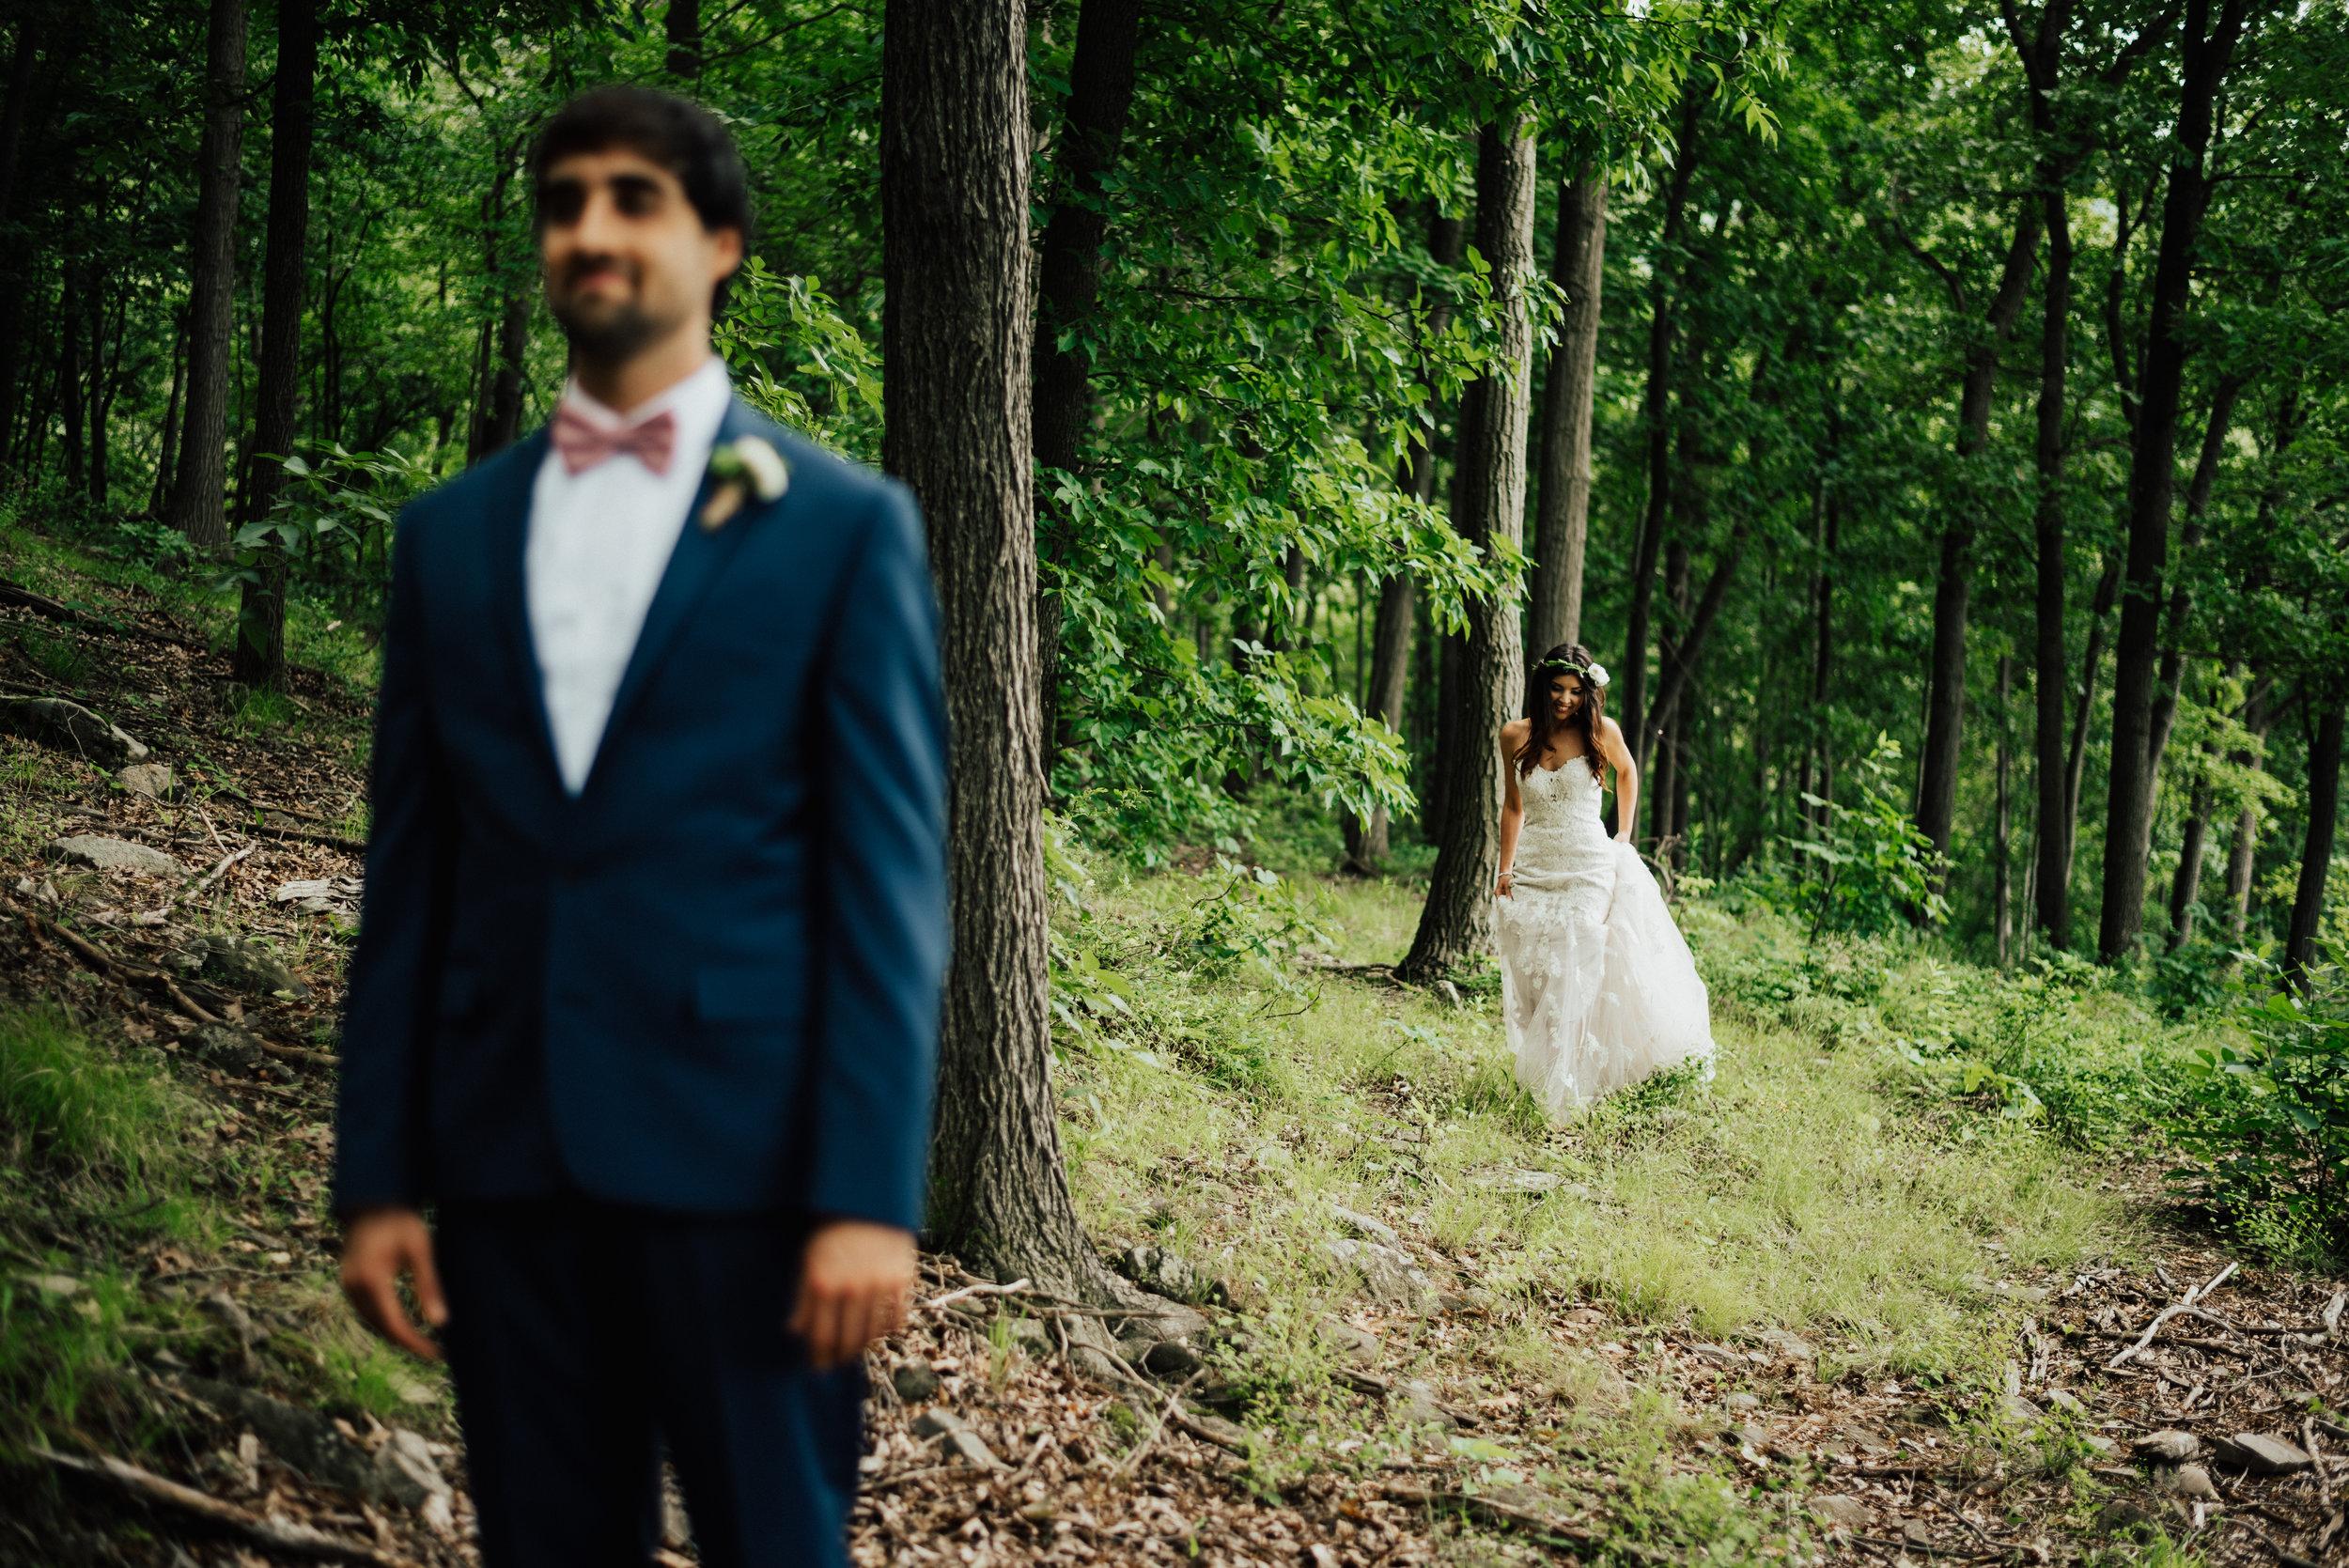 myriah-byron-wedding_pre-ceremony138.jpg